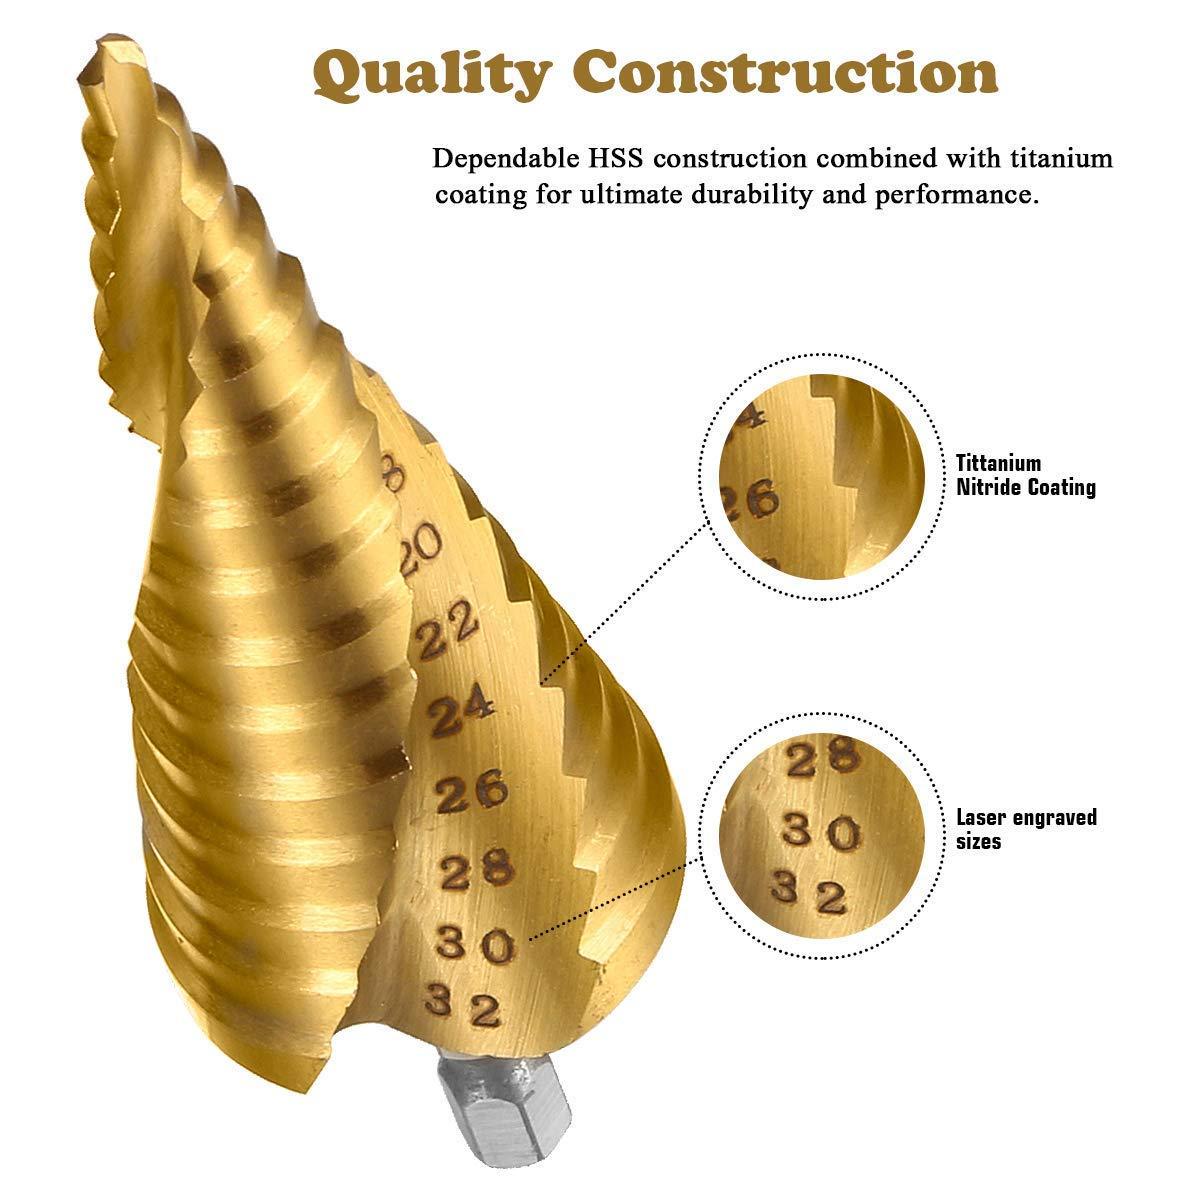 HSS Stufenbohrer Set,Gocheer 3 stück Stufenbohrer Schälbohrer Kegelbohrer Set,Spiral Gerillt,mit Tasche(4-12mm /4-20mm /4-32mm),für Edelstahl,Metall,Holz,Kunststoff,Aluminium, Kupfer,DIY usw (Golden)